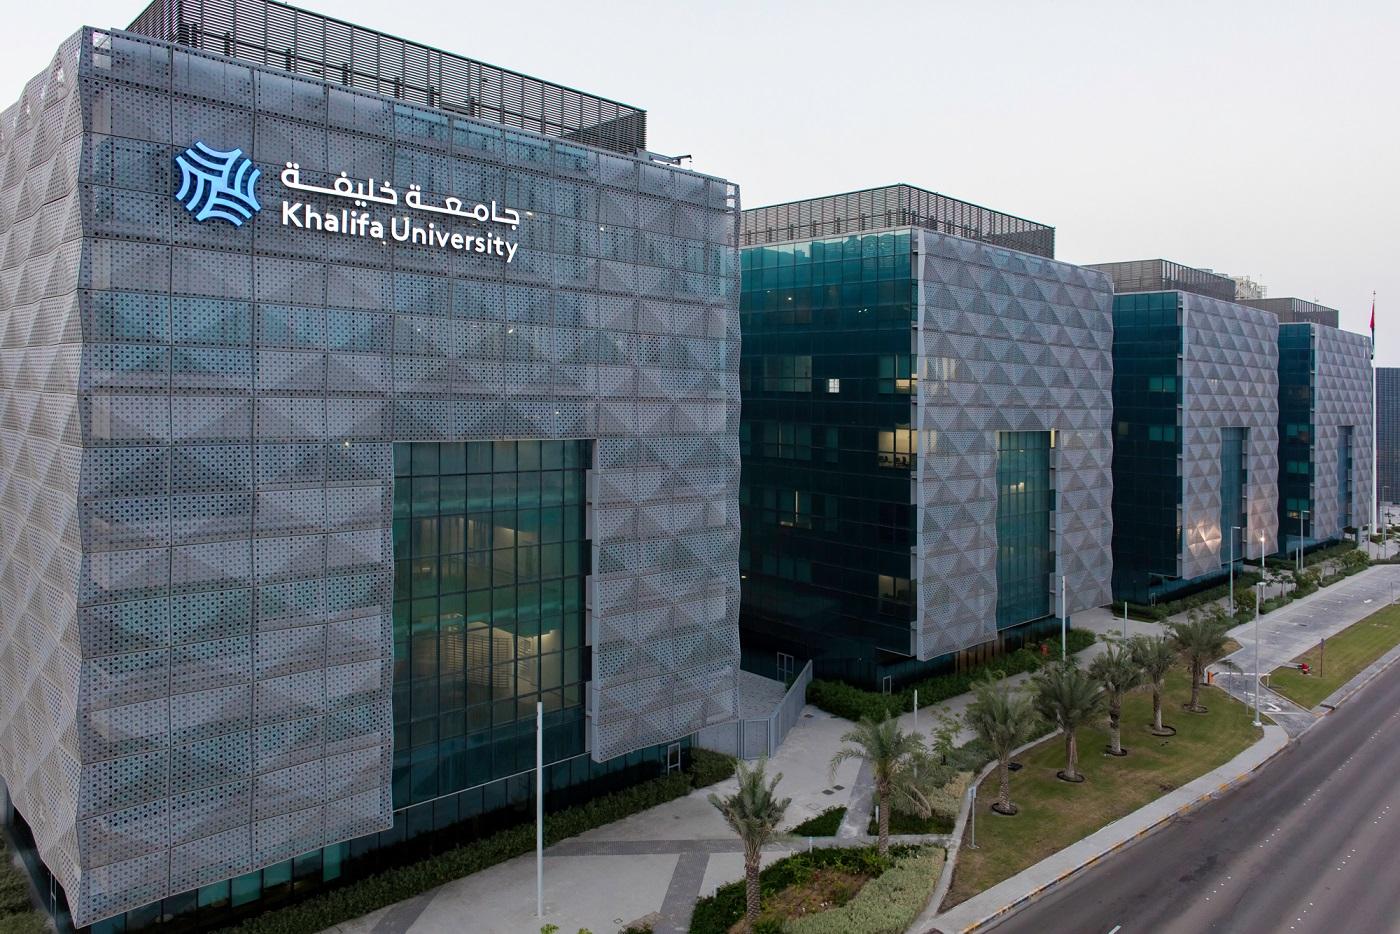 Khalifa University Organizing Four-Day Fall 2021 Orientation for Newly-Enrolled Undergraduate, Post-Graduate and Medical Students